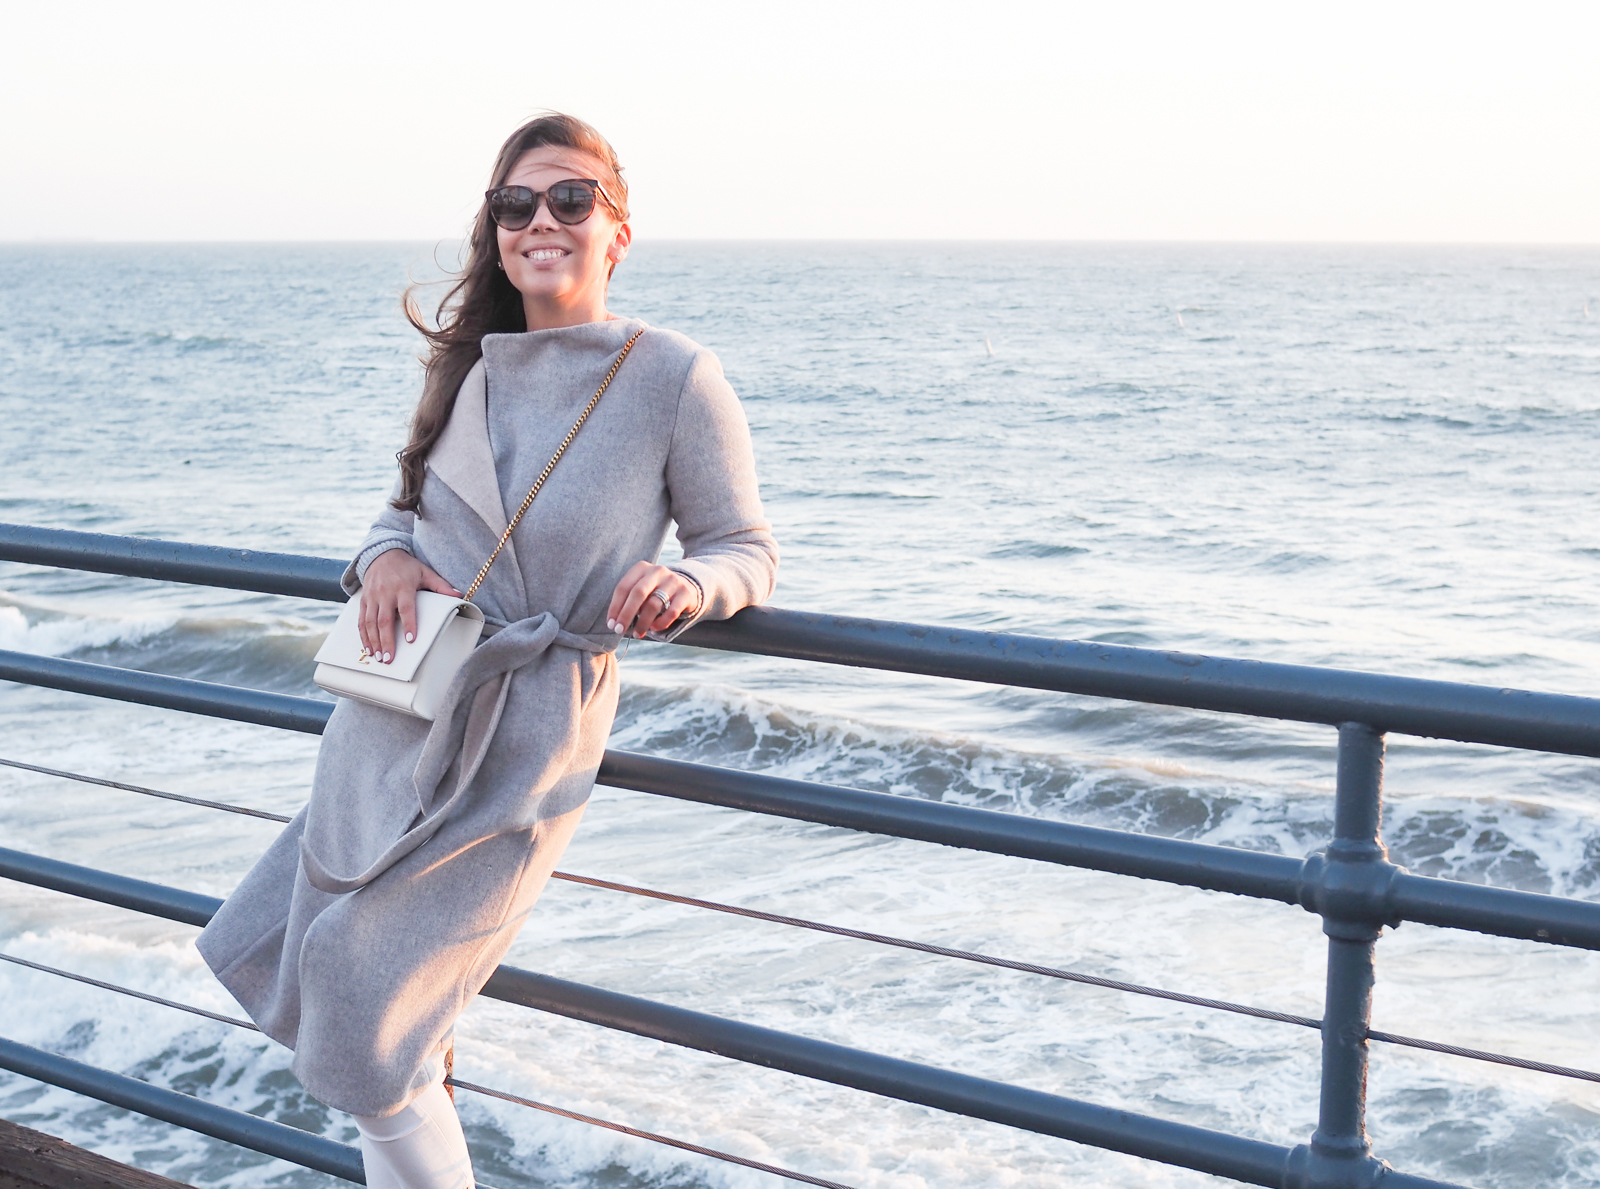 santa monica pier outfit metti-1230902